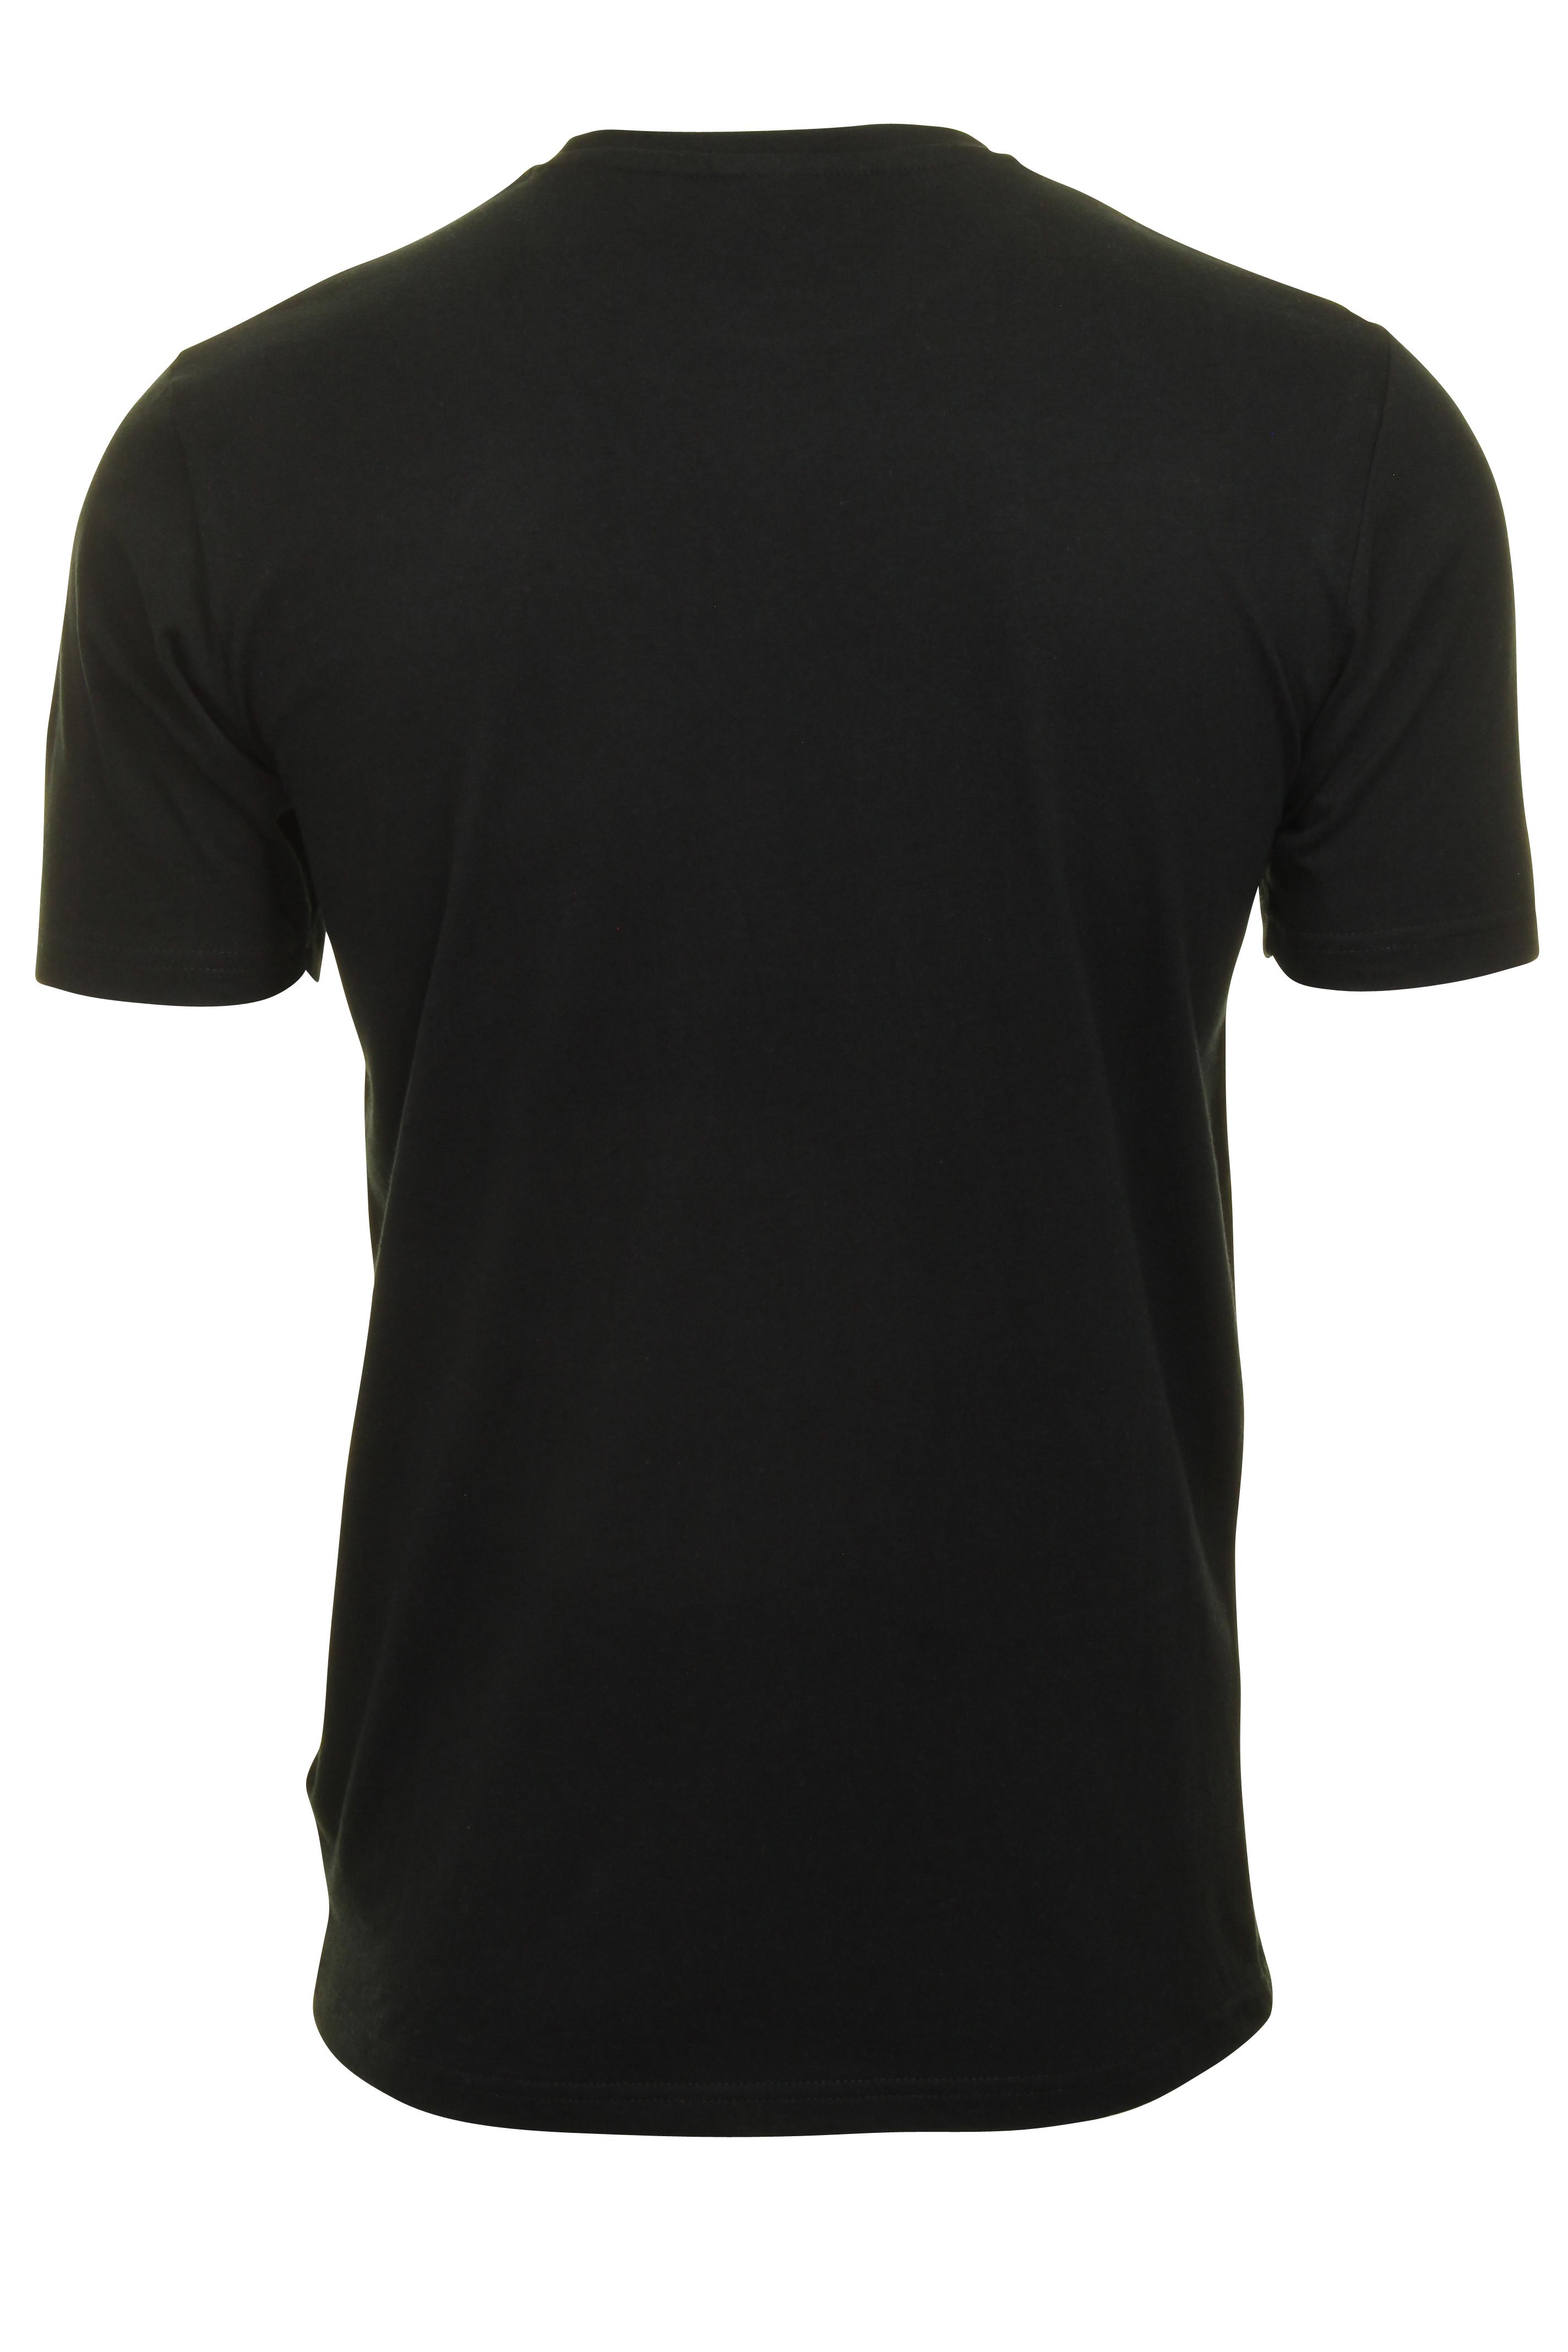 Mens-Ellesse-T-Shirt-039-Prado-039-Short-Sleeved thumbnail 5